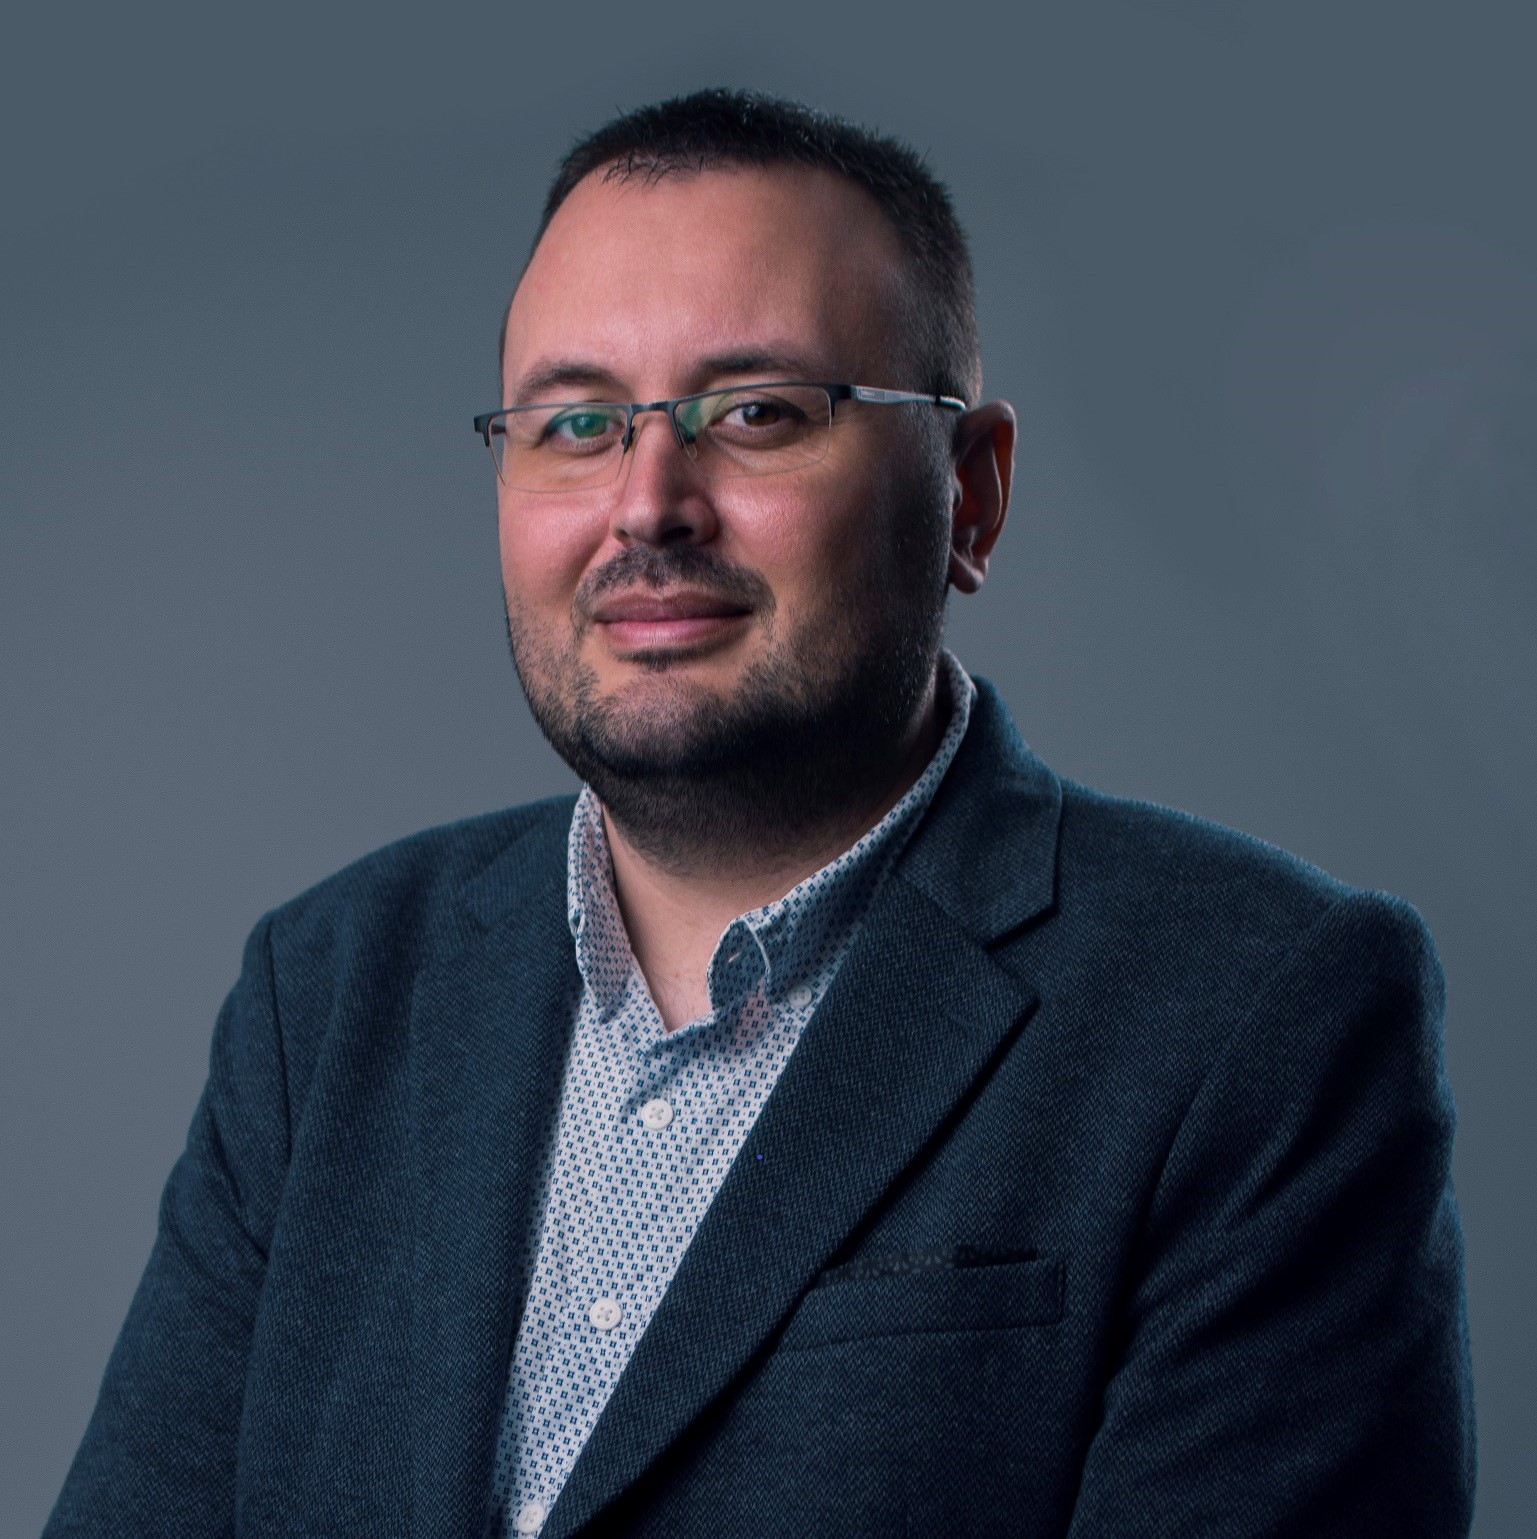 Дарјан Карабашевић